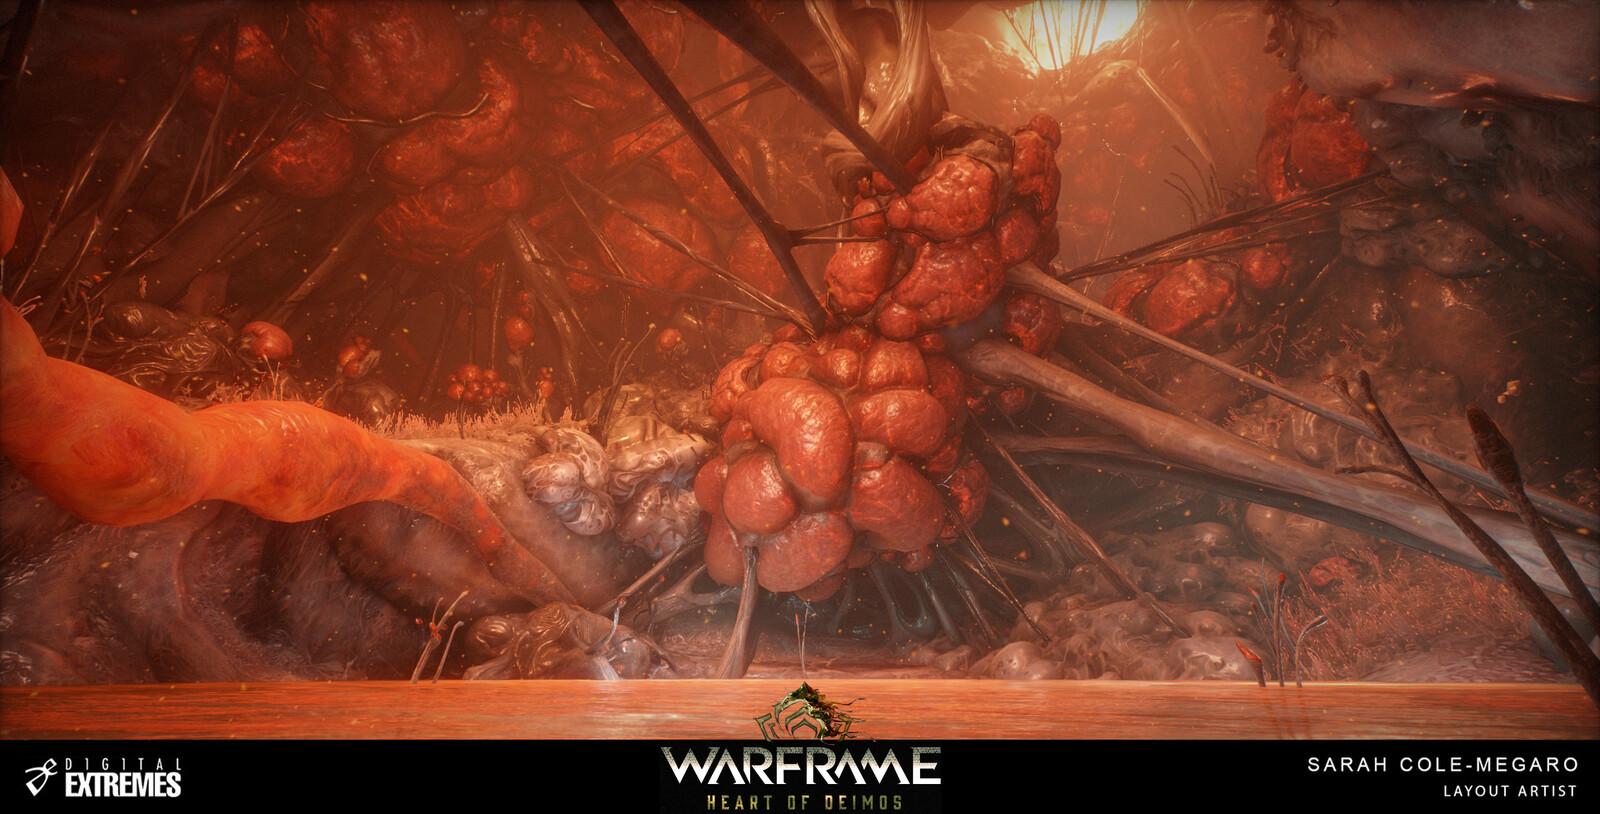 WarFrame: Heart of Deimos